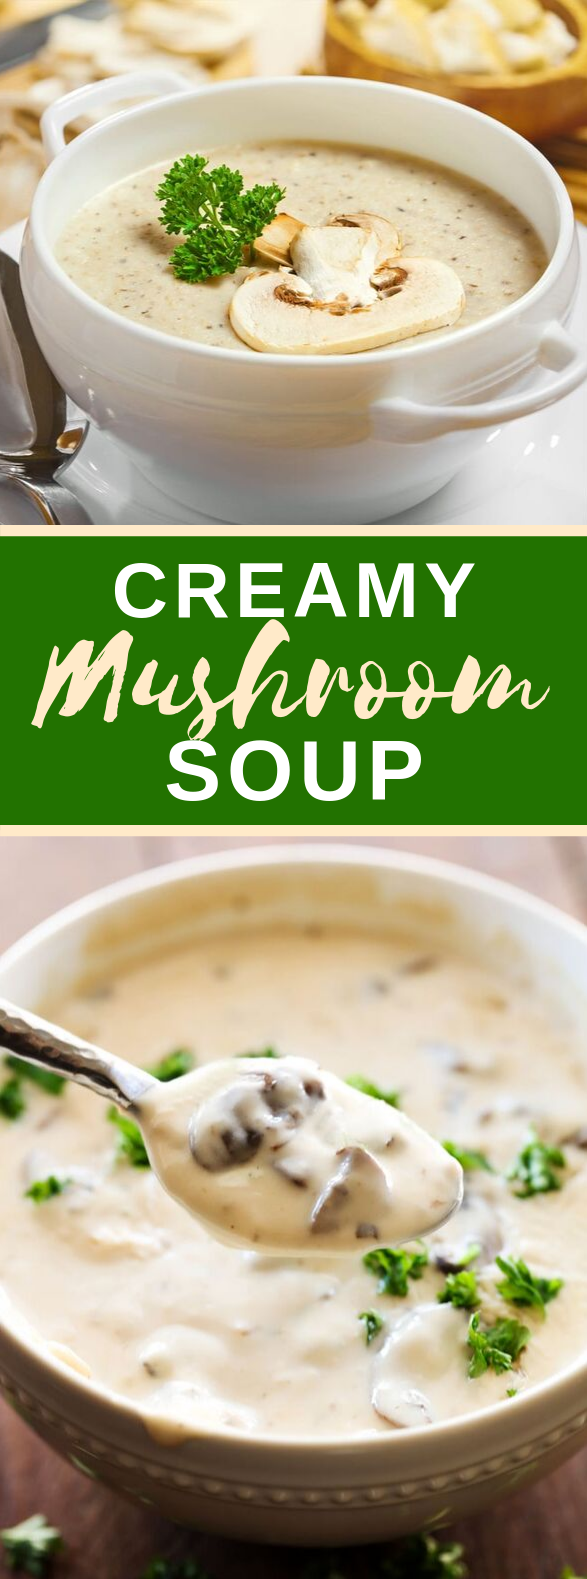 Creamy Mushroom Soup #vegetarian #lunch